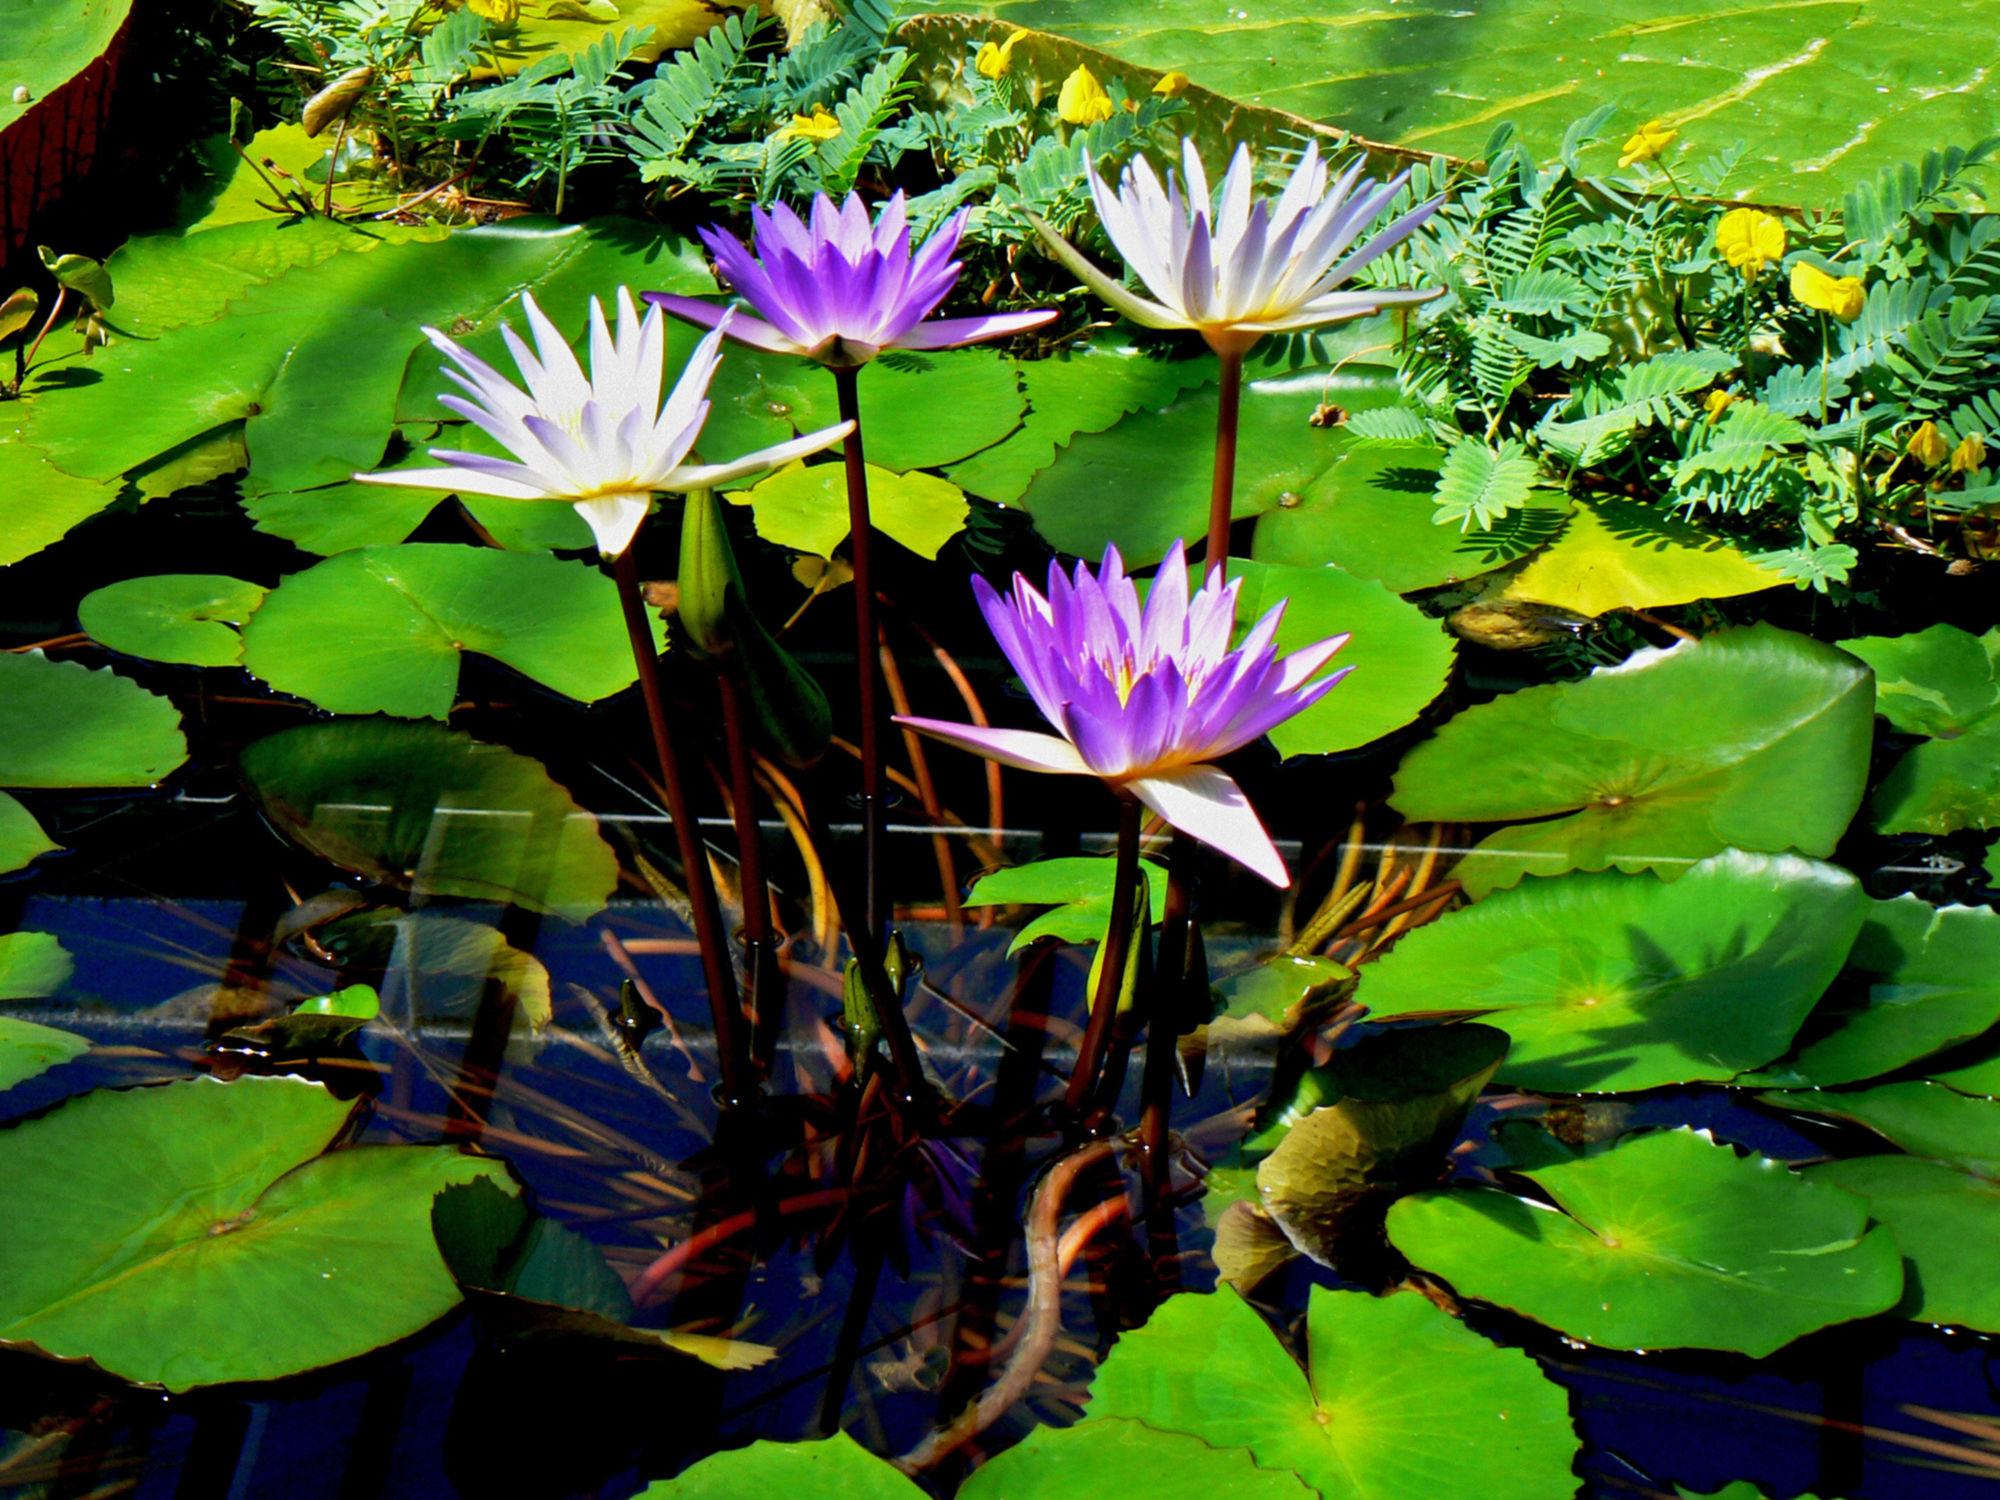 Bild mit Wasser, Seen, See, Teich, Seerosen, lotus, Blüten, blüte, Seerose, nahaufnahmen